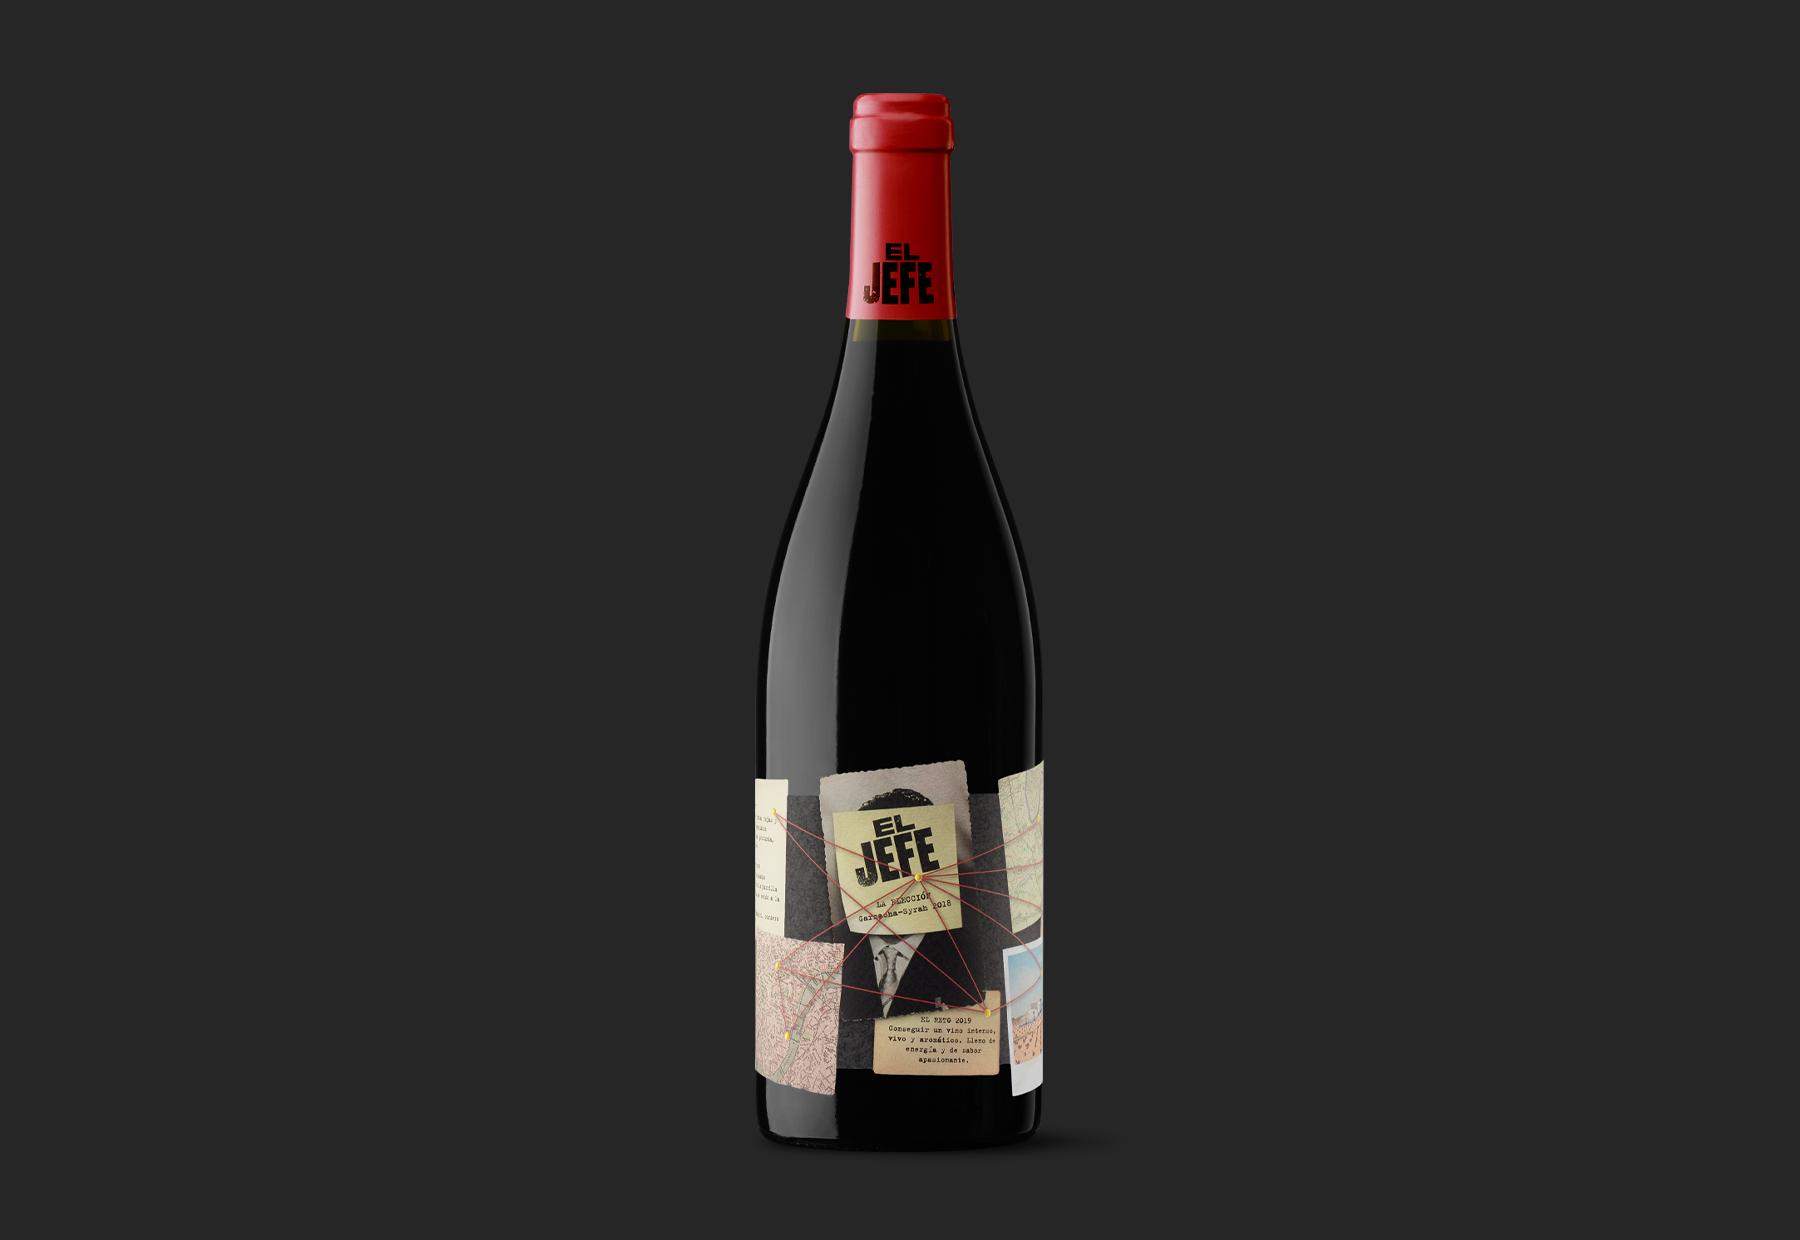 El Jefe Wine Packaging Design by Moruba